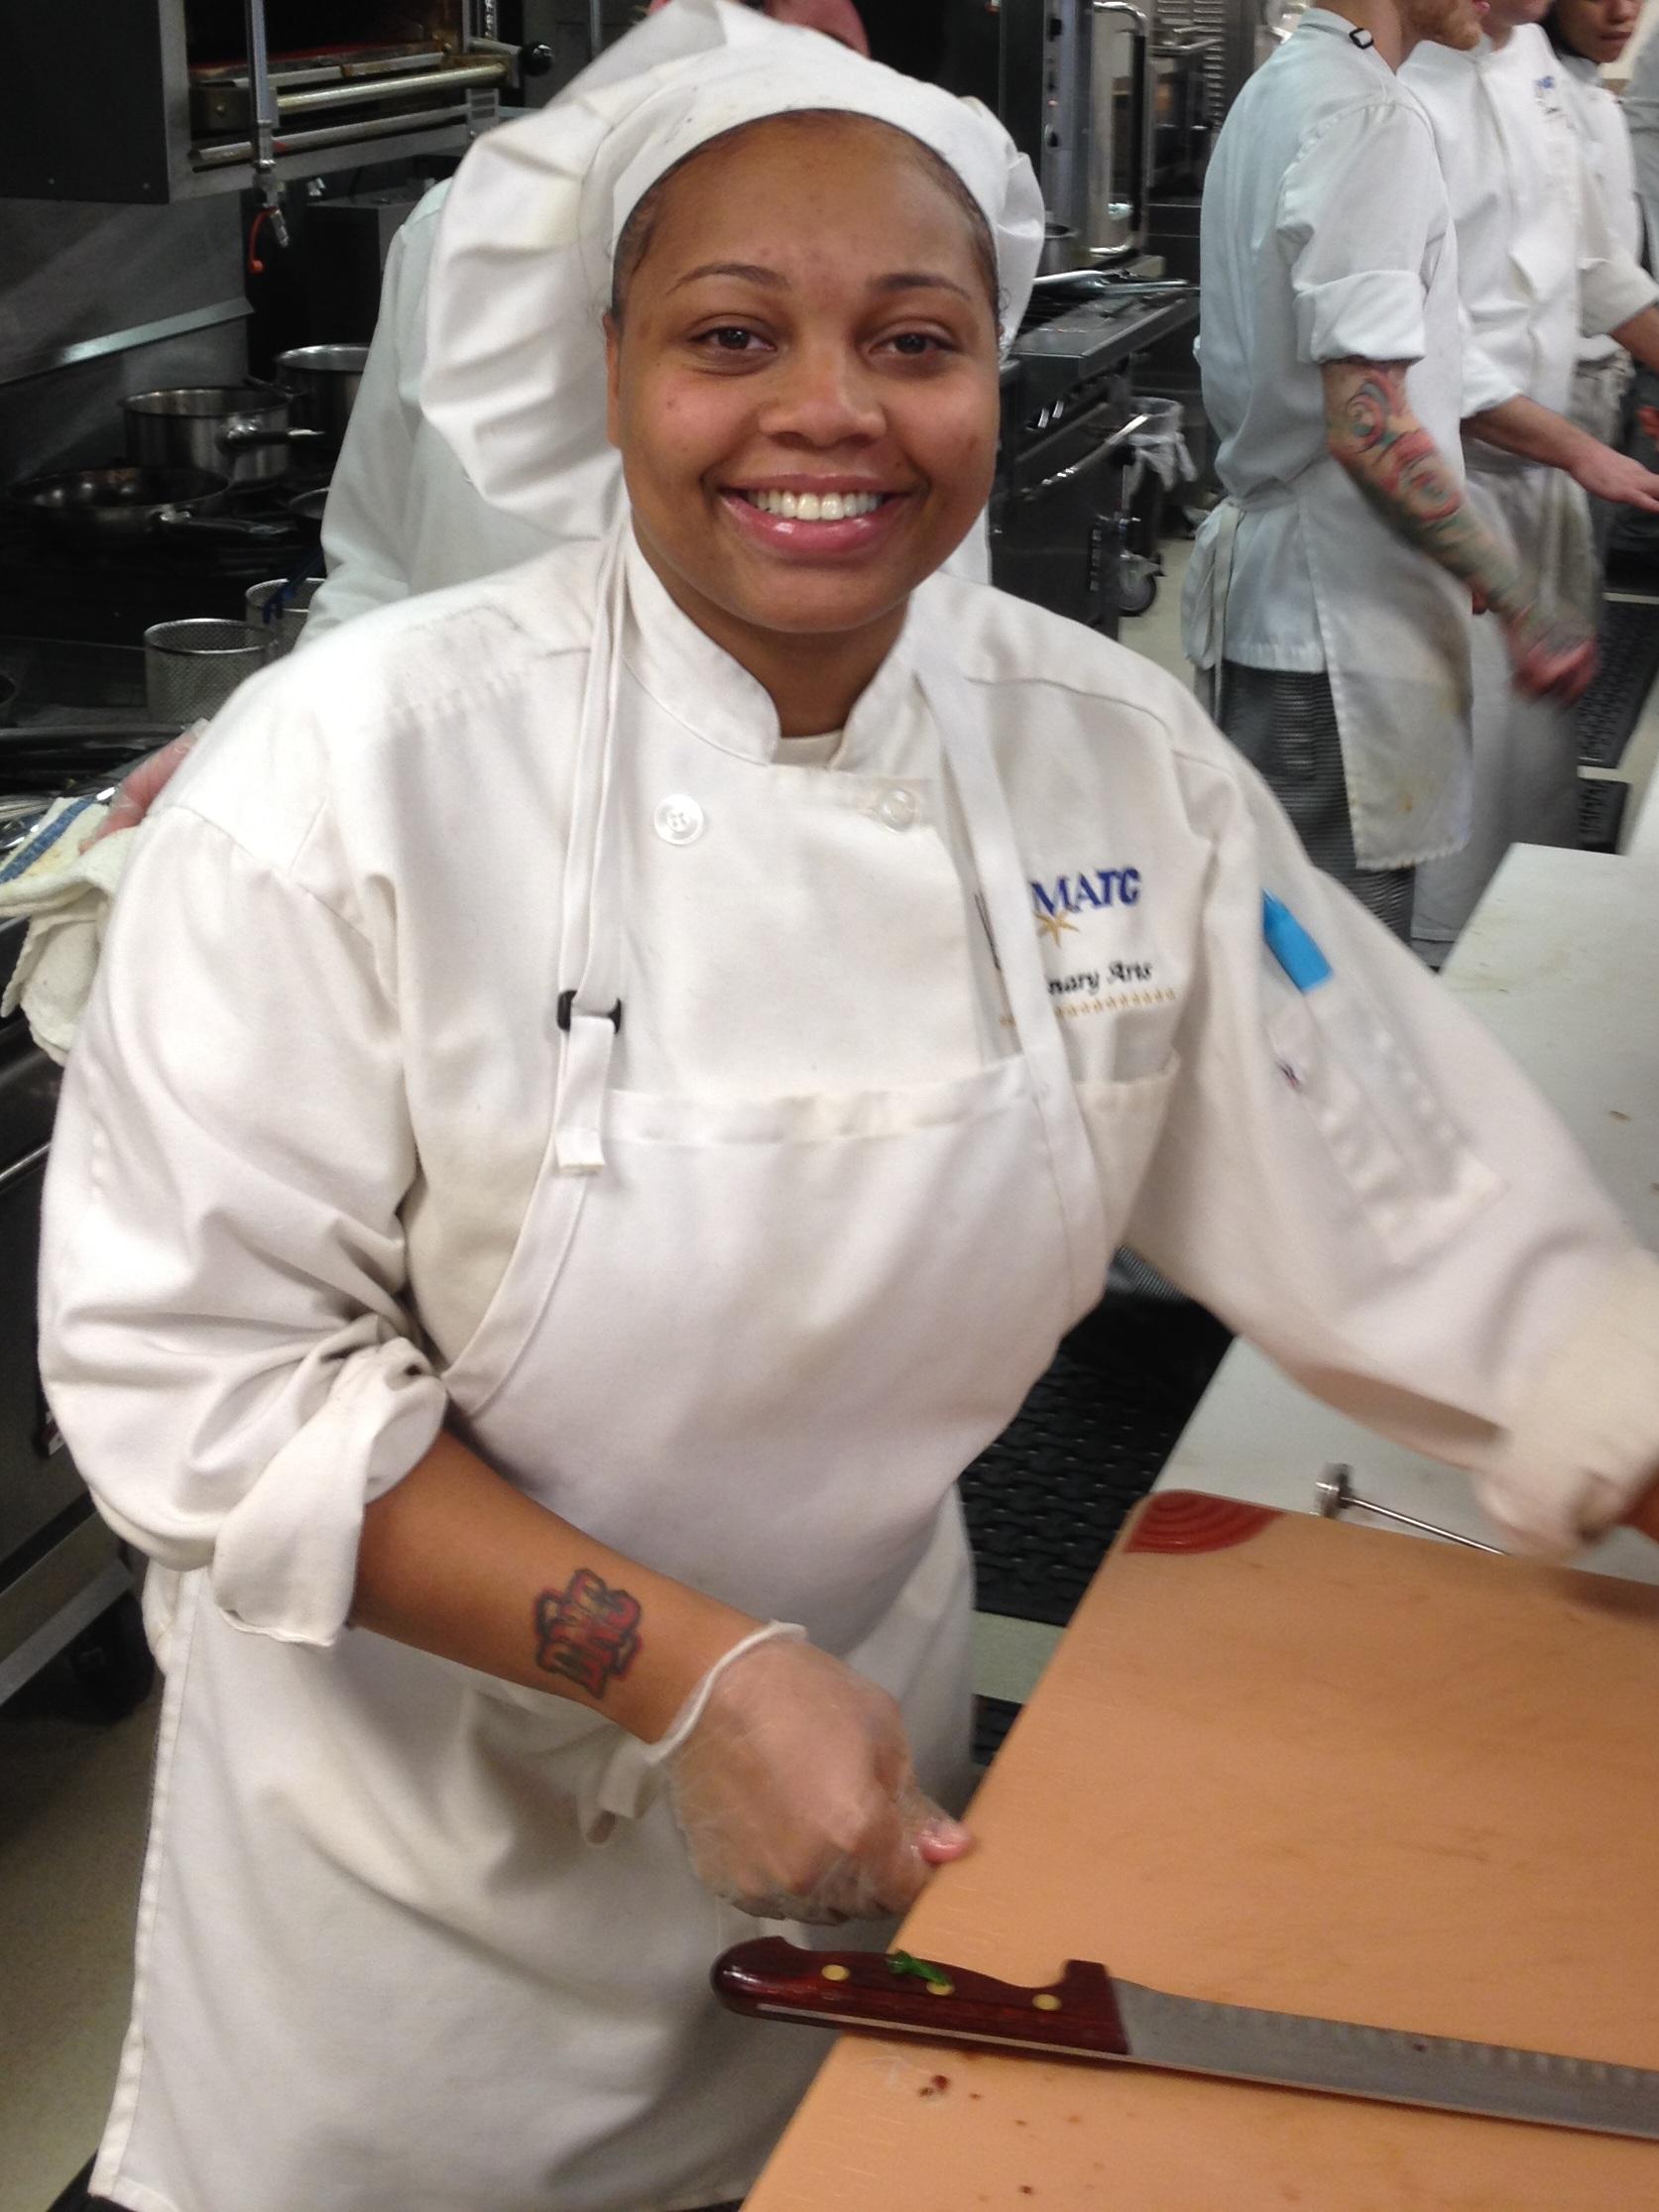 Culinary Schools -